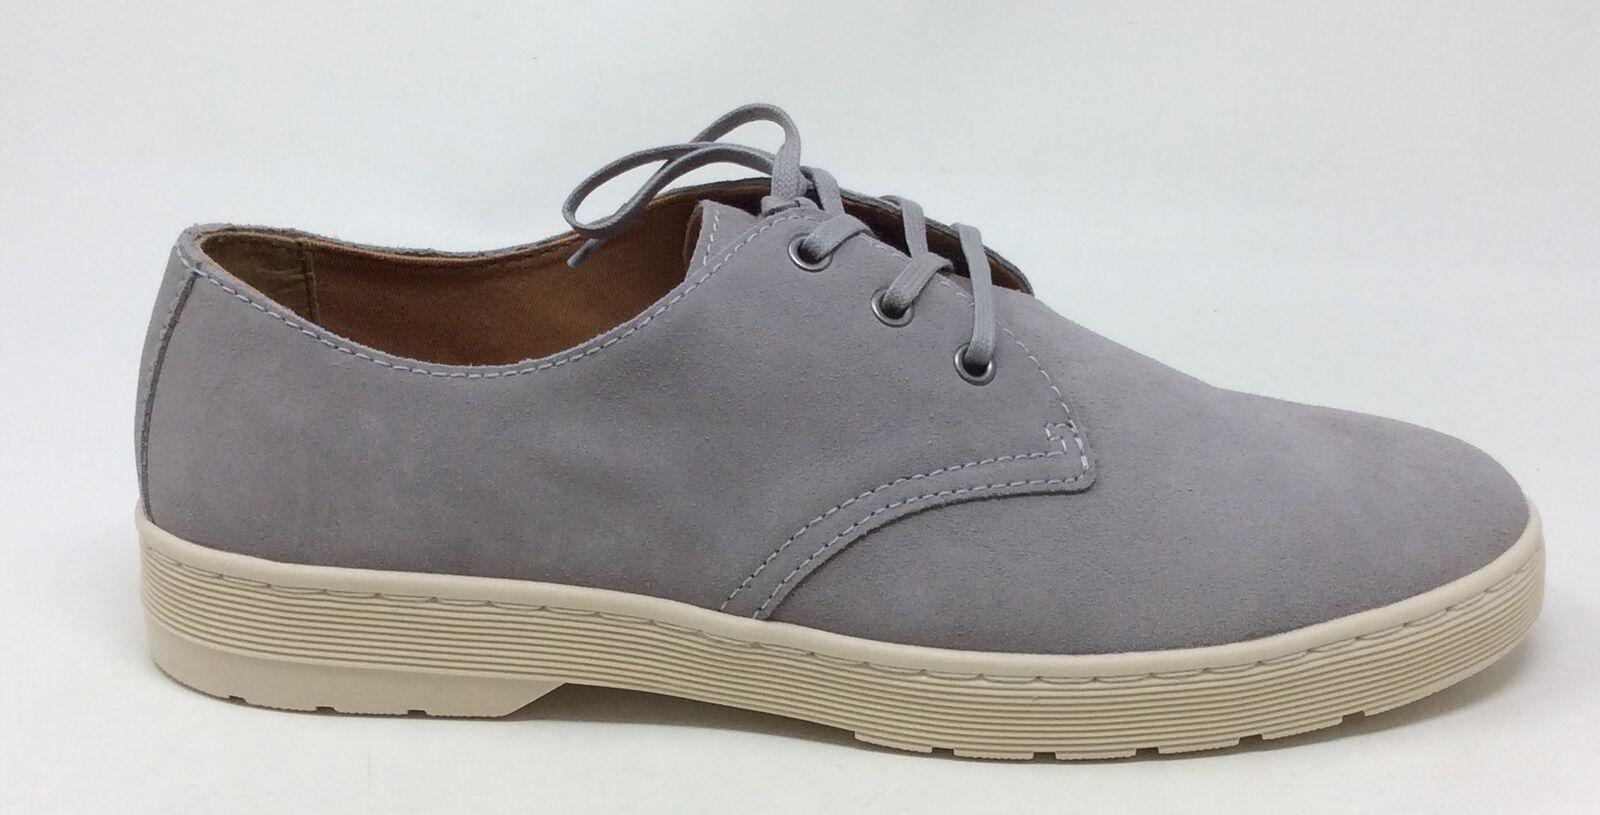 Dr. Martens Men's Cgoldnado Oxford shoes Mid Grey Suede Size 12 UK   13 US